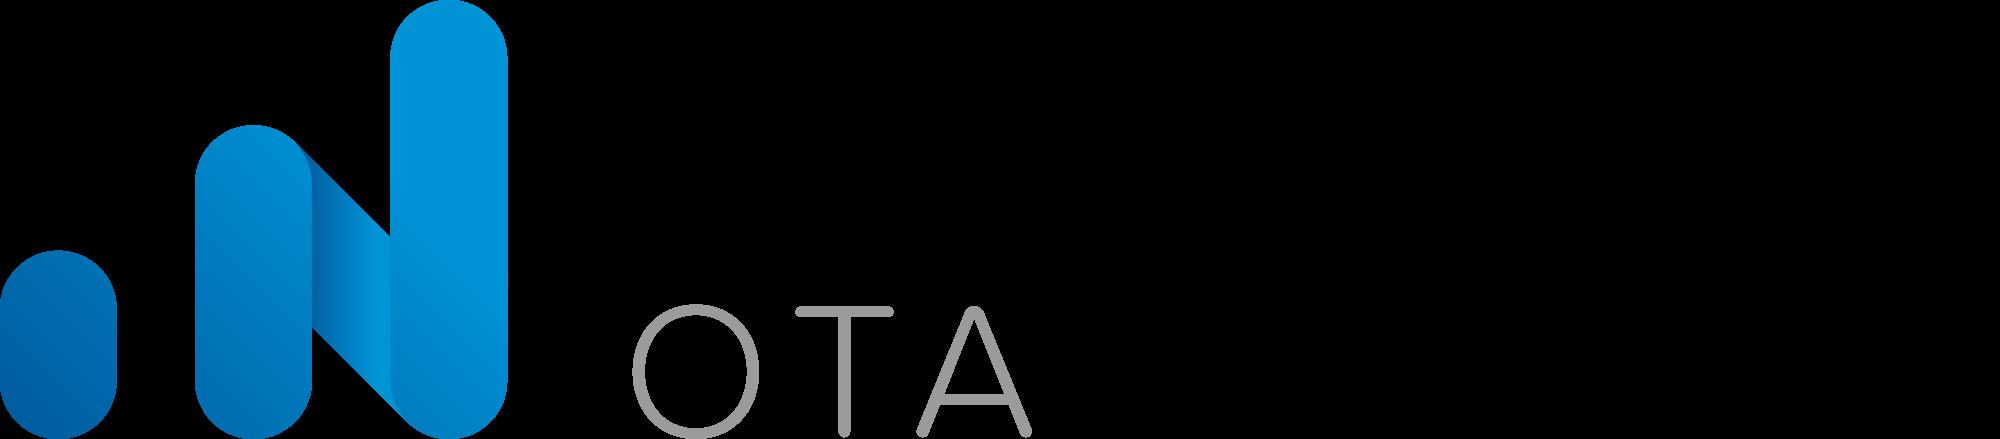 OTA Insight